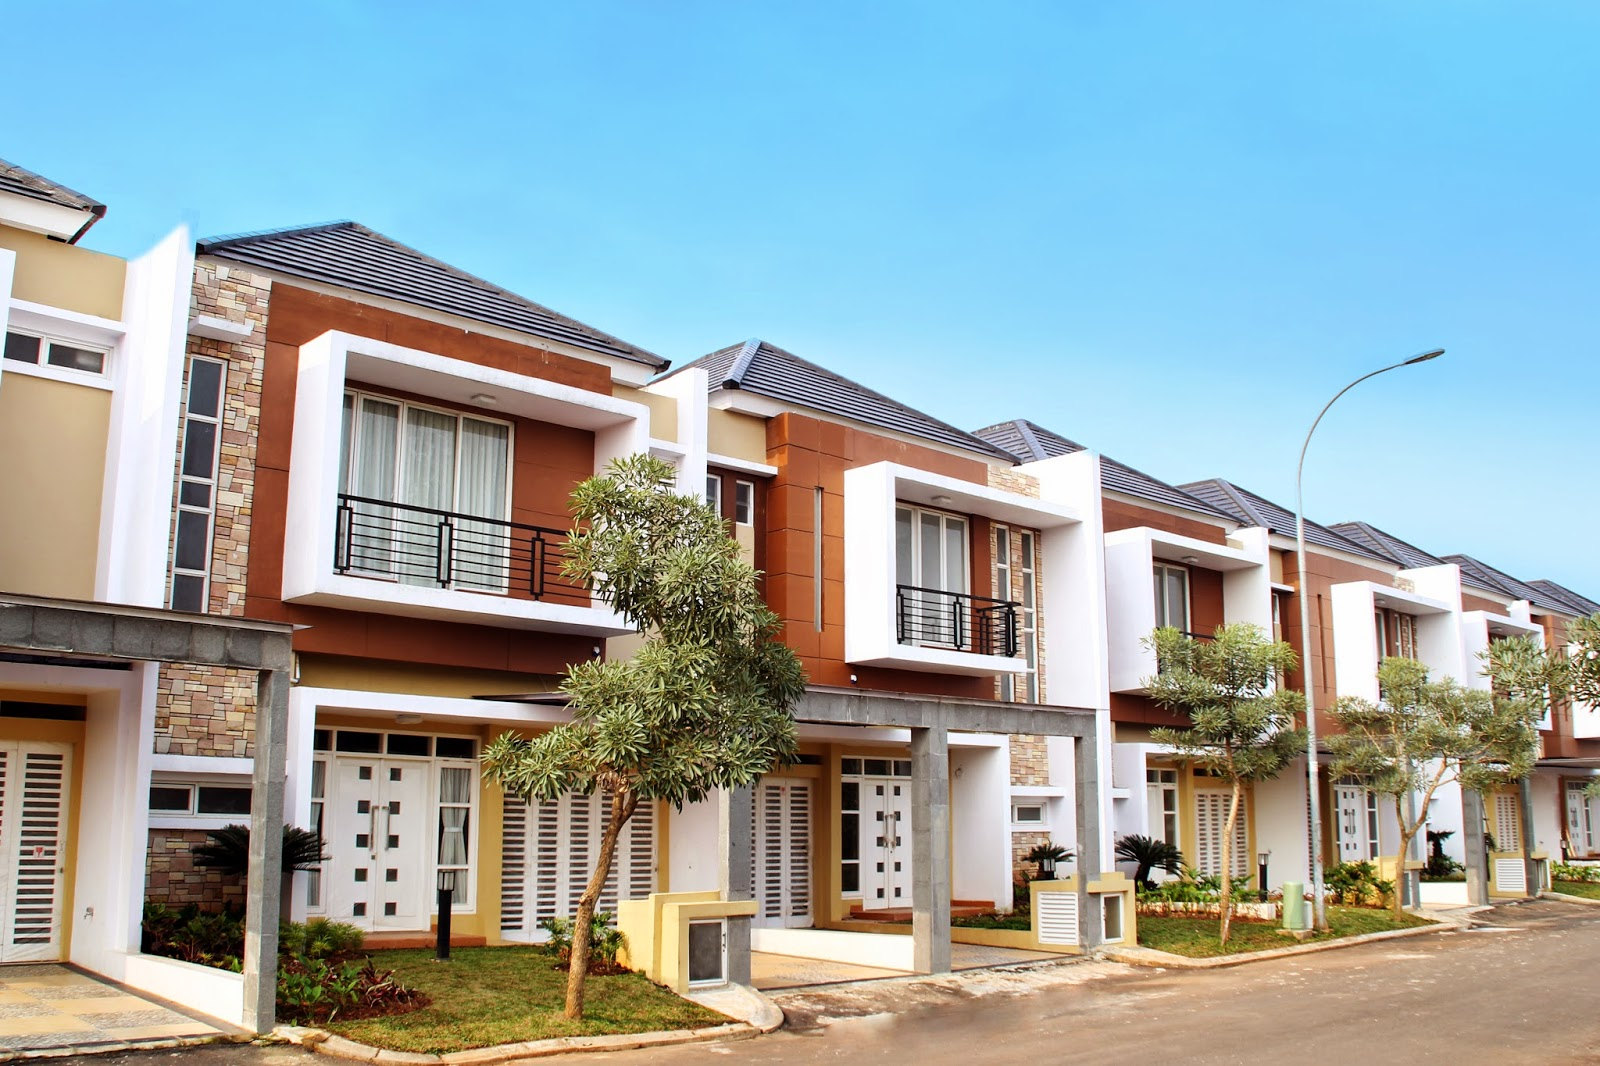 Rumah Idaman Investasi Masa Depan